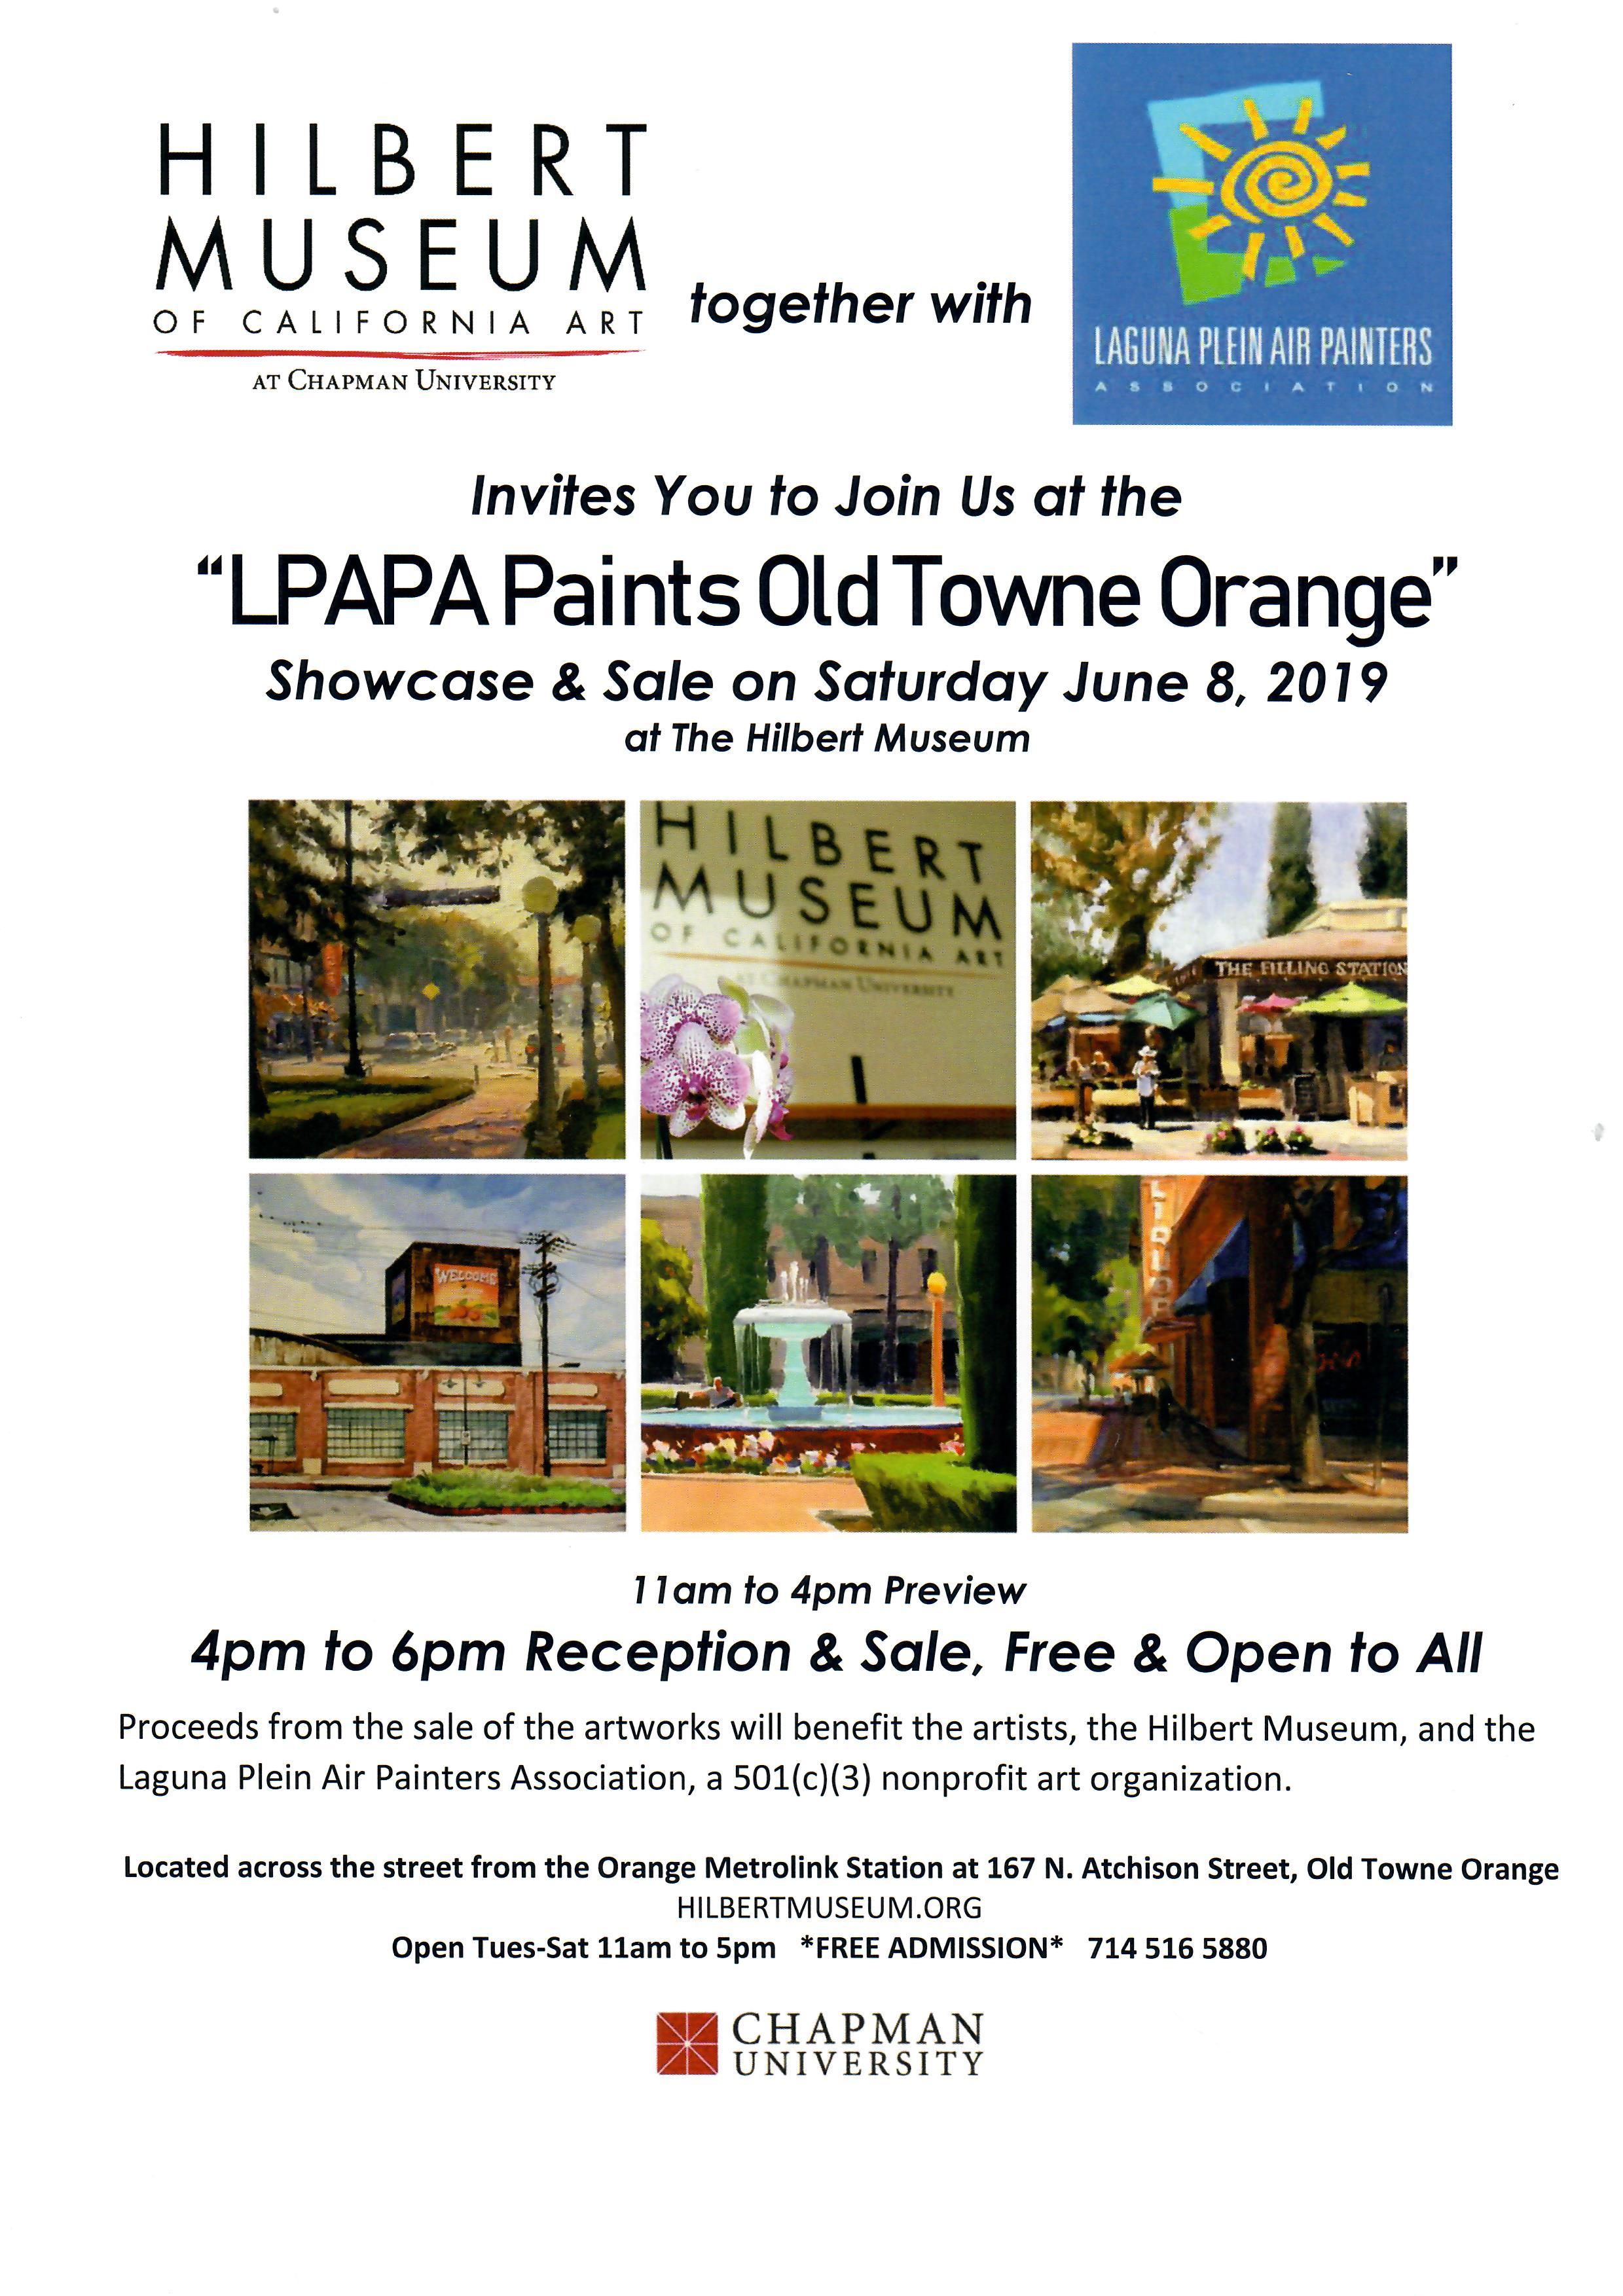 Old Towne Orange flyer.jpeg